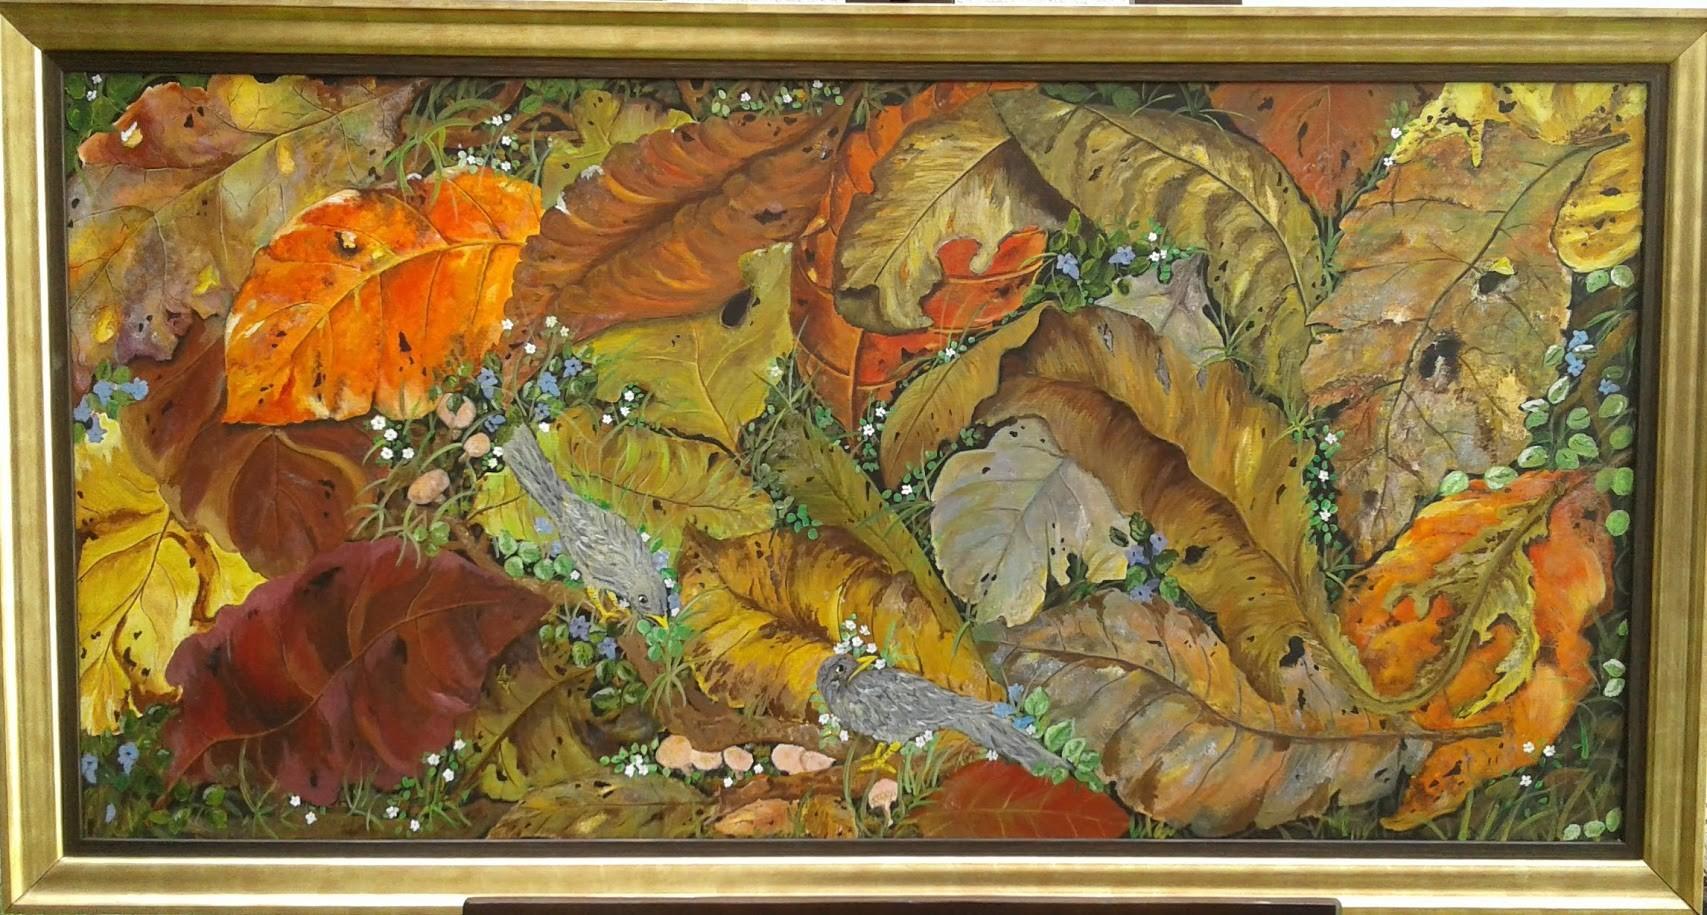 Freshly fallen leaves by Iranganie Wickramasinghe